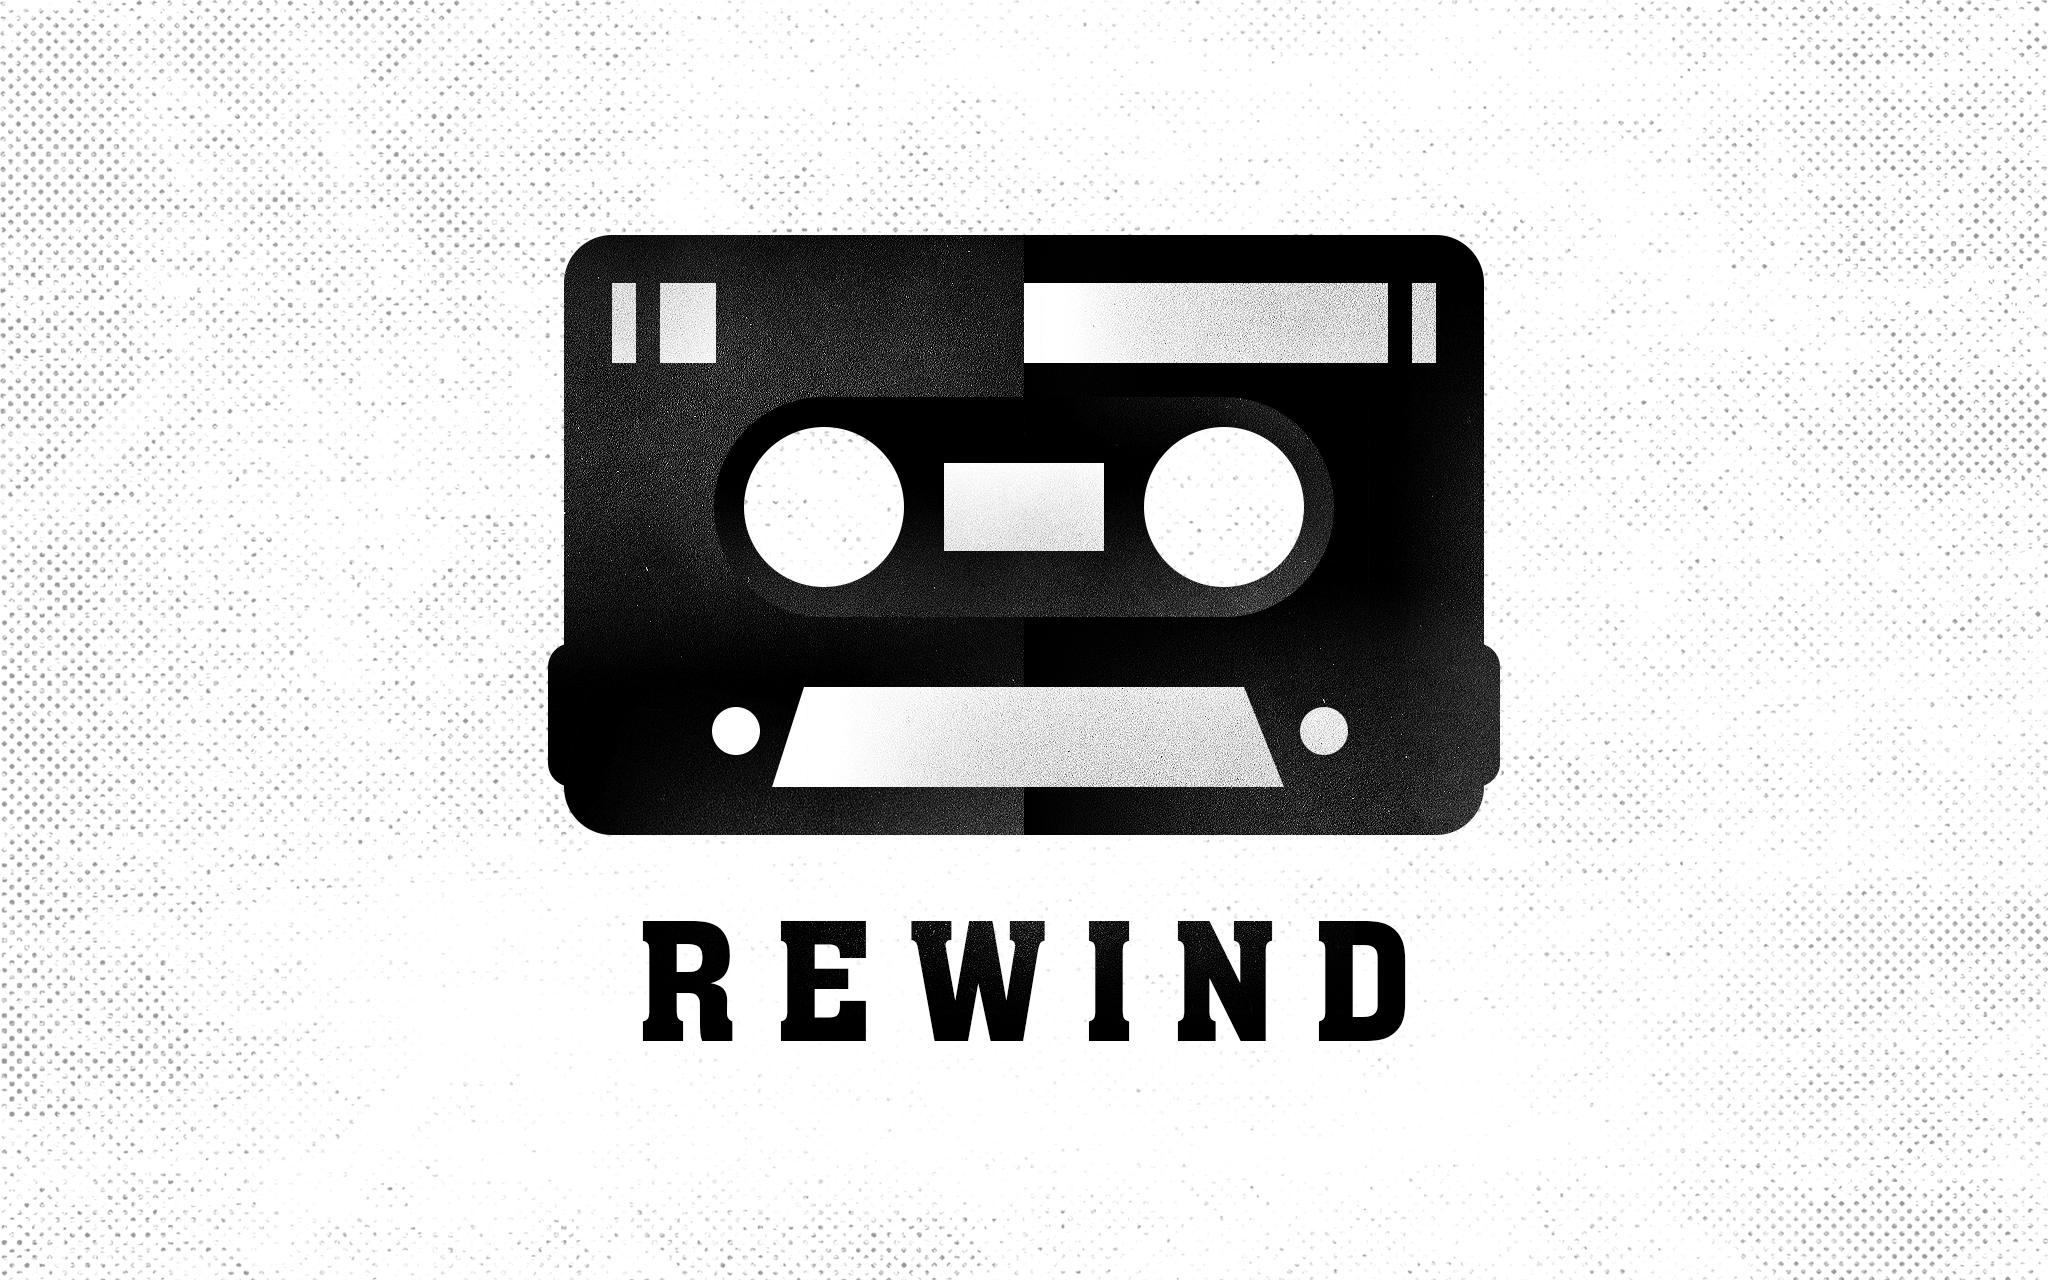 Cover Image rewind2